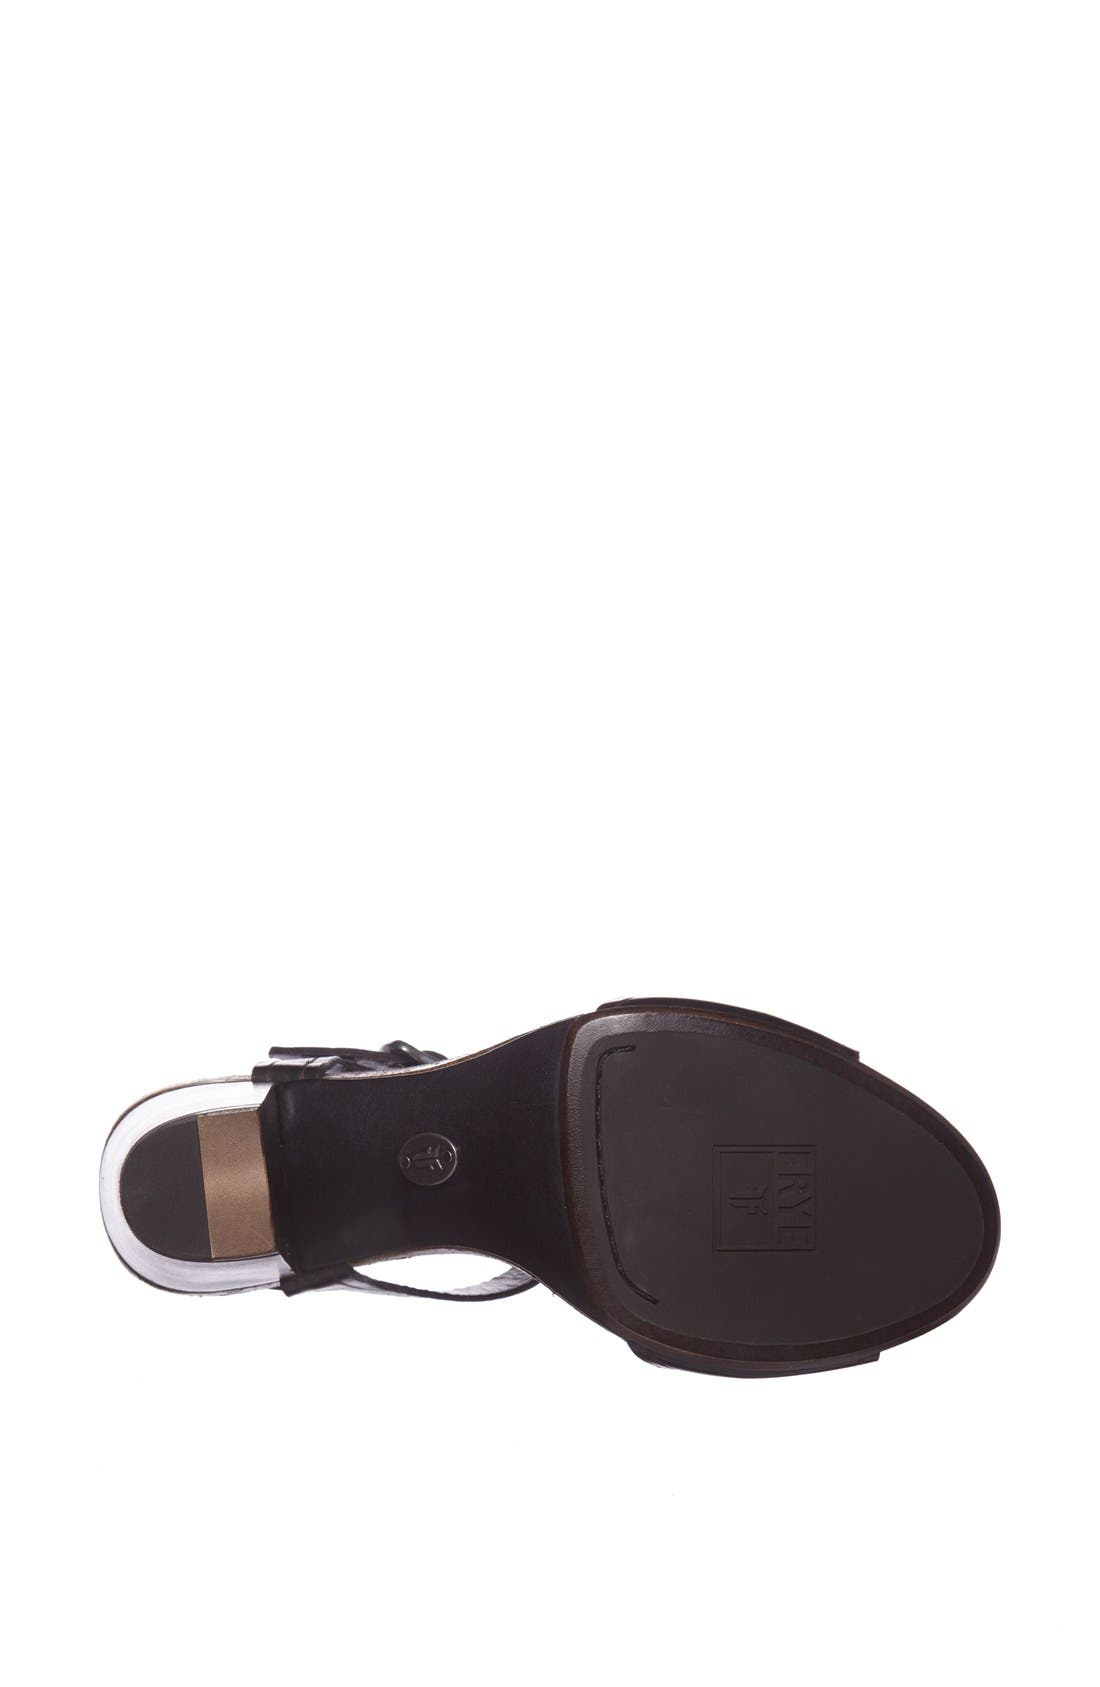 FRYE, 'Silvie' Y-Strap Leather Sandal, Alternate thumbnail 2, color, 001